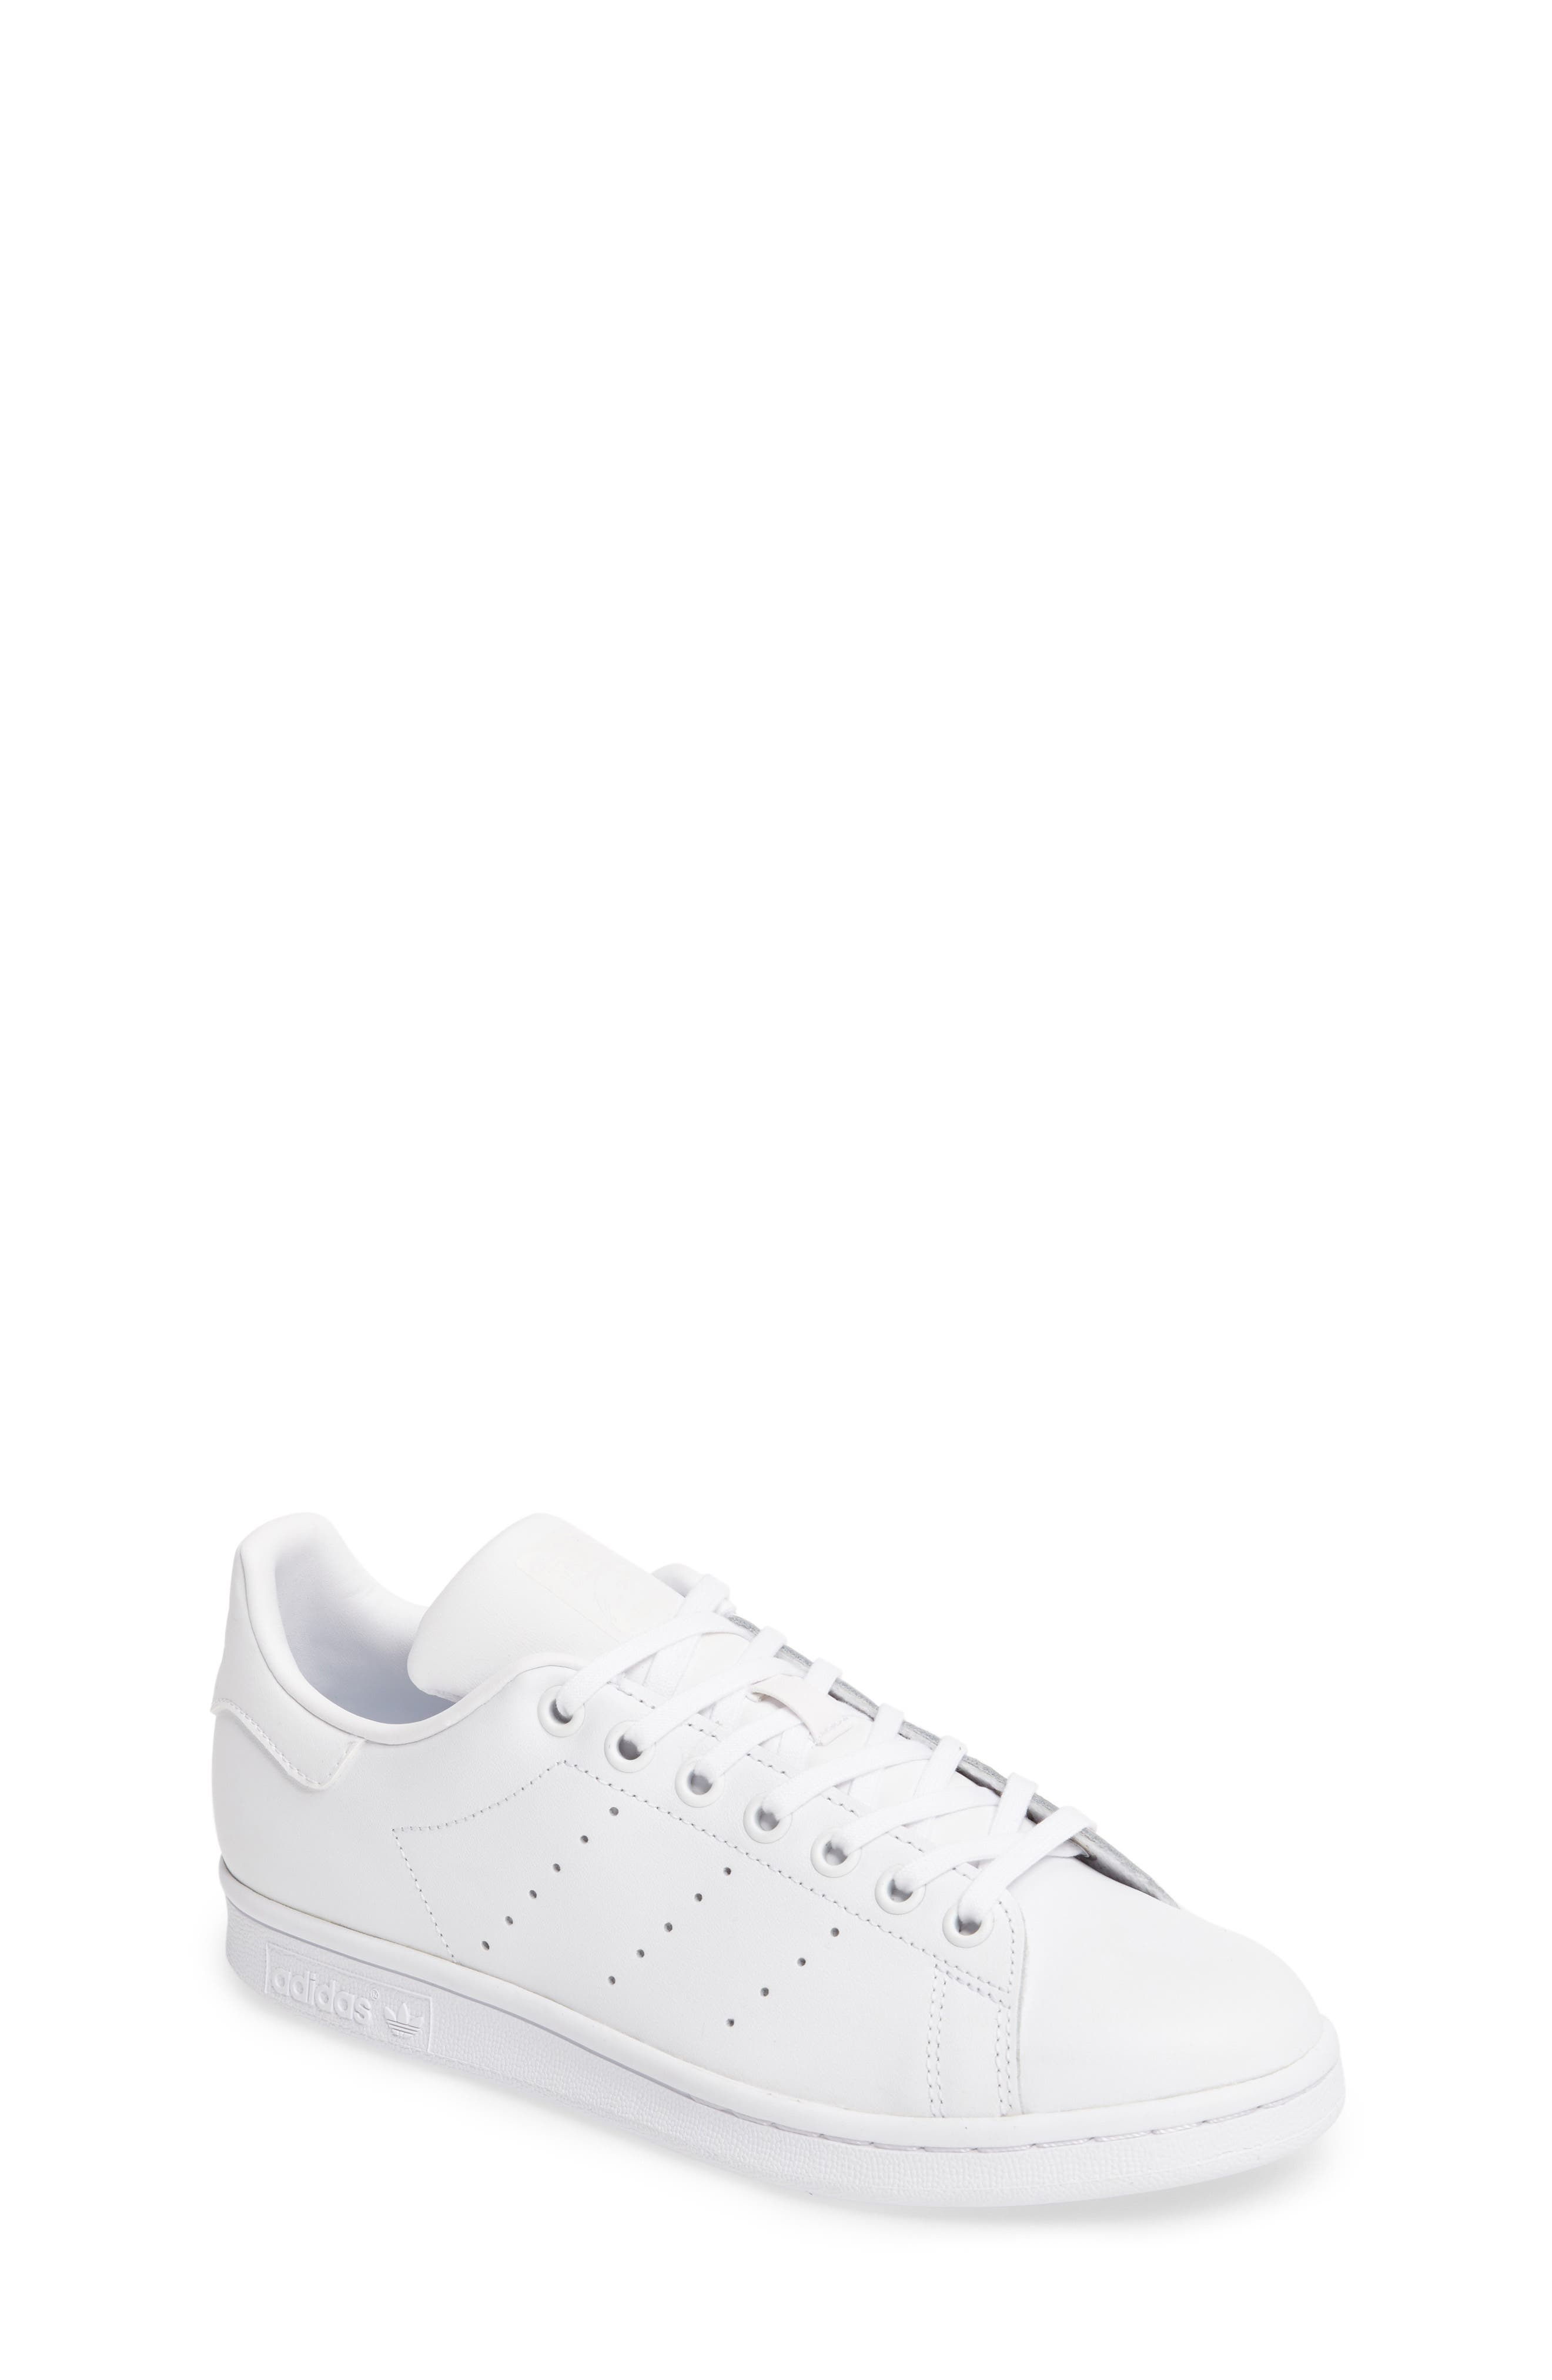 Main Image - adidas \u0027Stan Smith\u0027 Leather Sneaker (Big Kid)